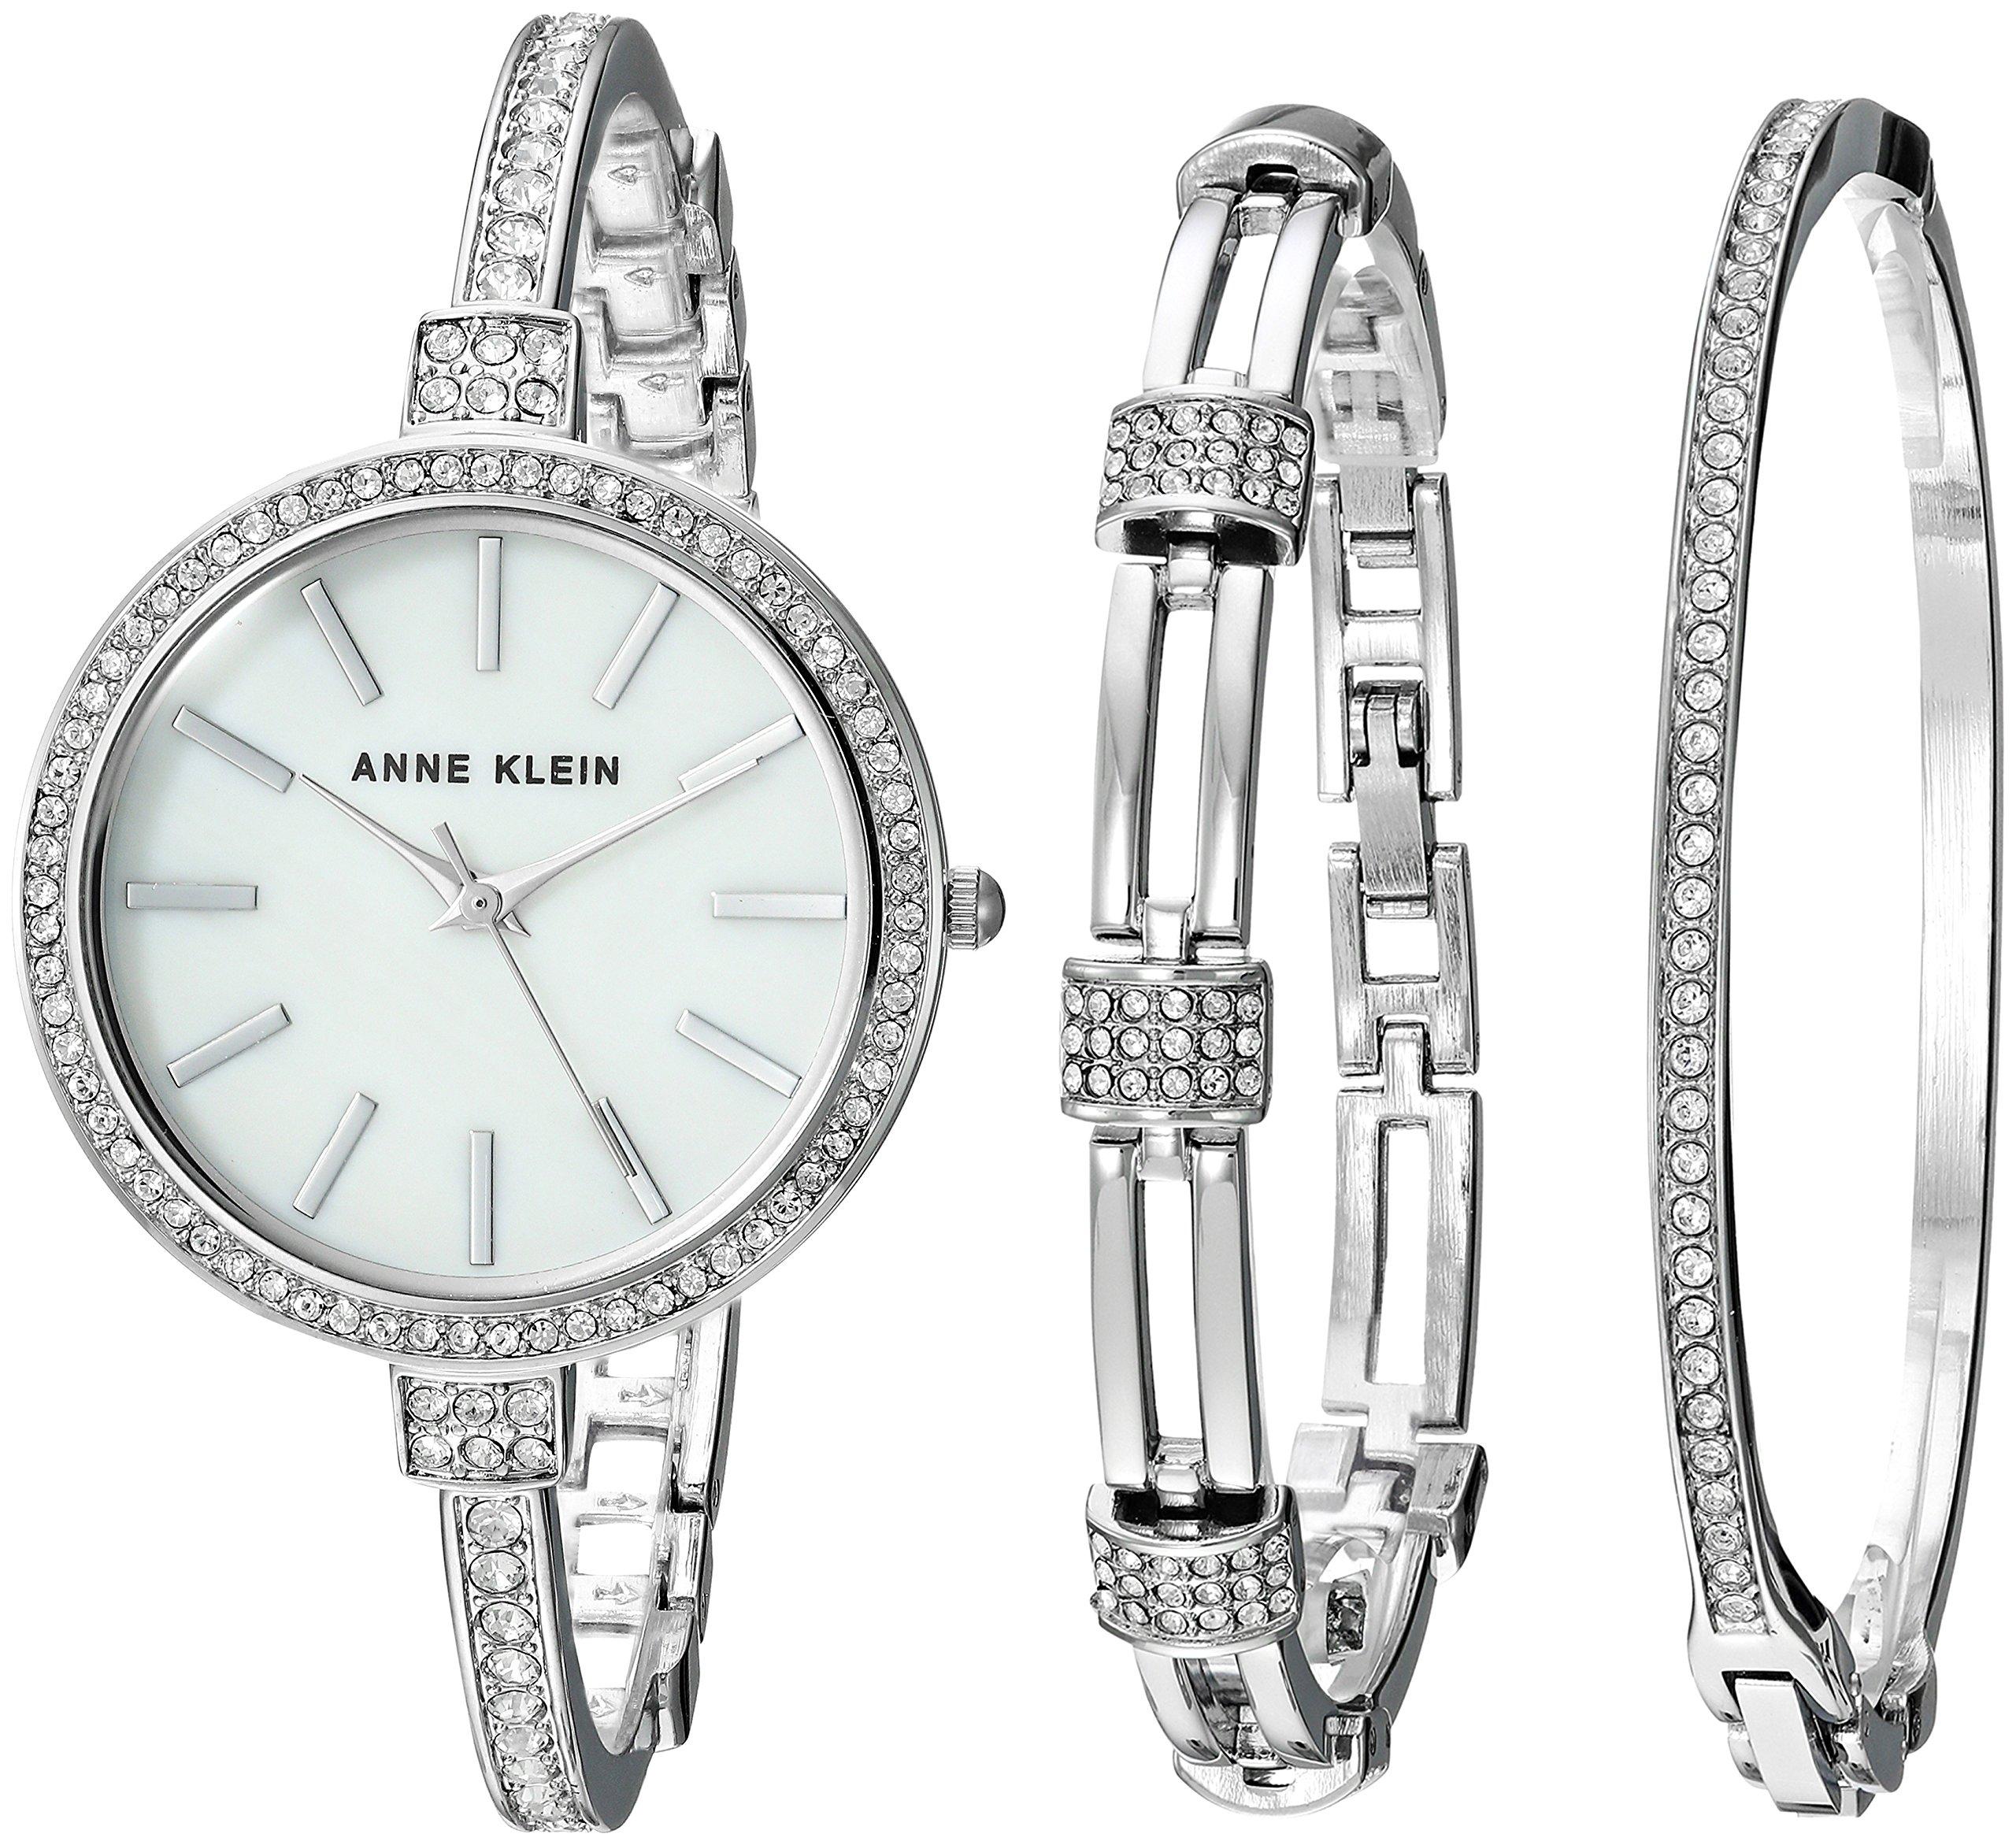 Anne Klein Women's AK/2847SVST Swarovski Crystal Accented Silver-Tone Watch and Bangle Set